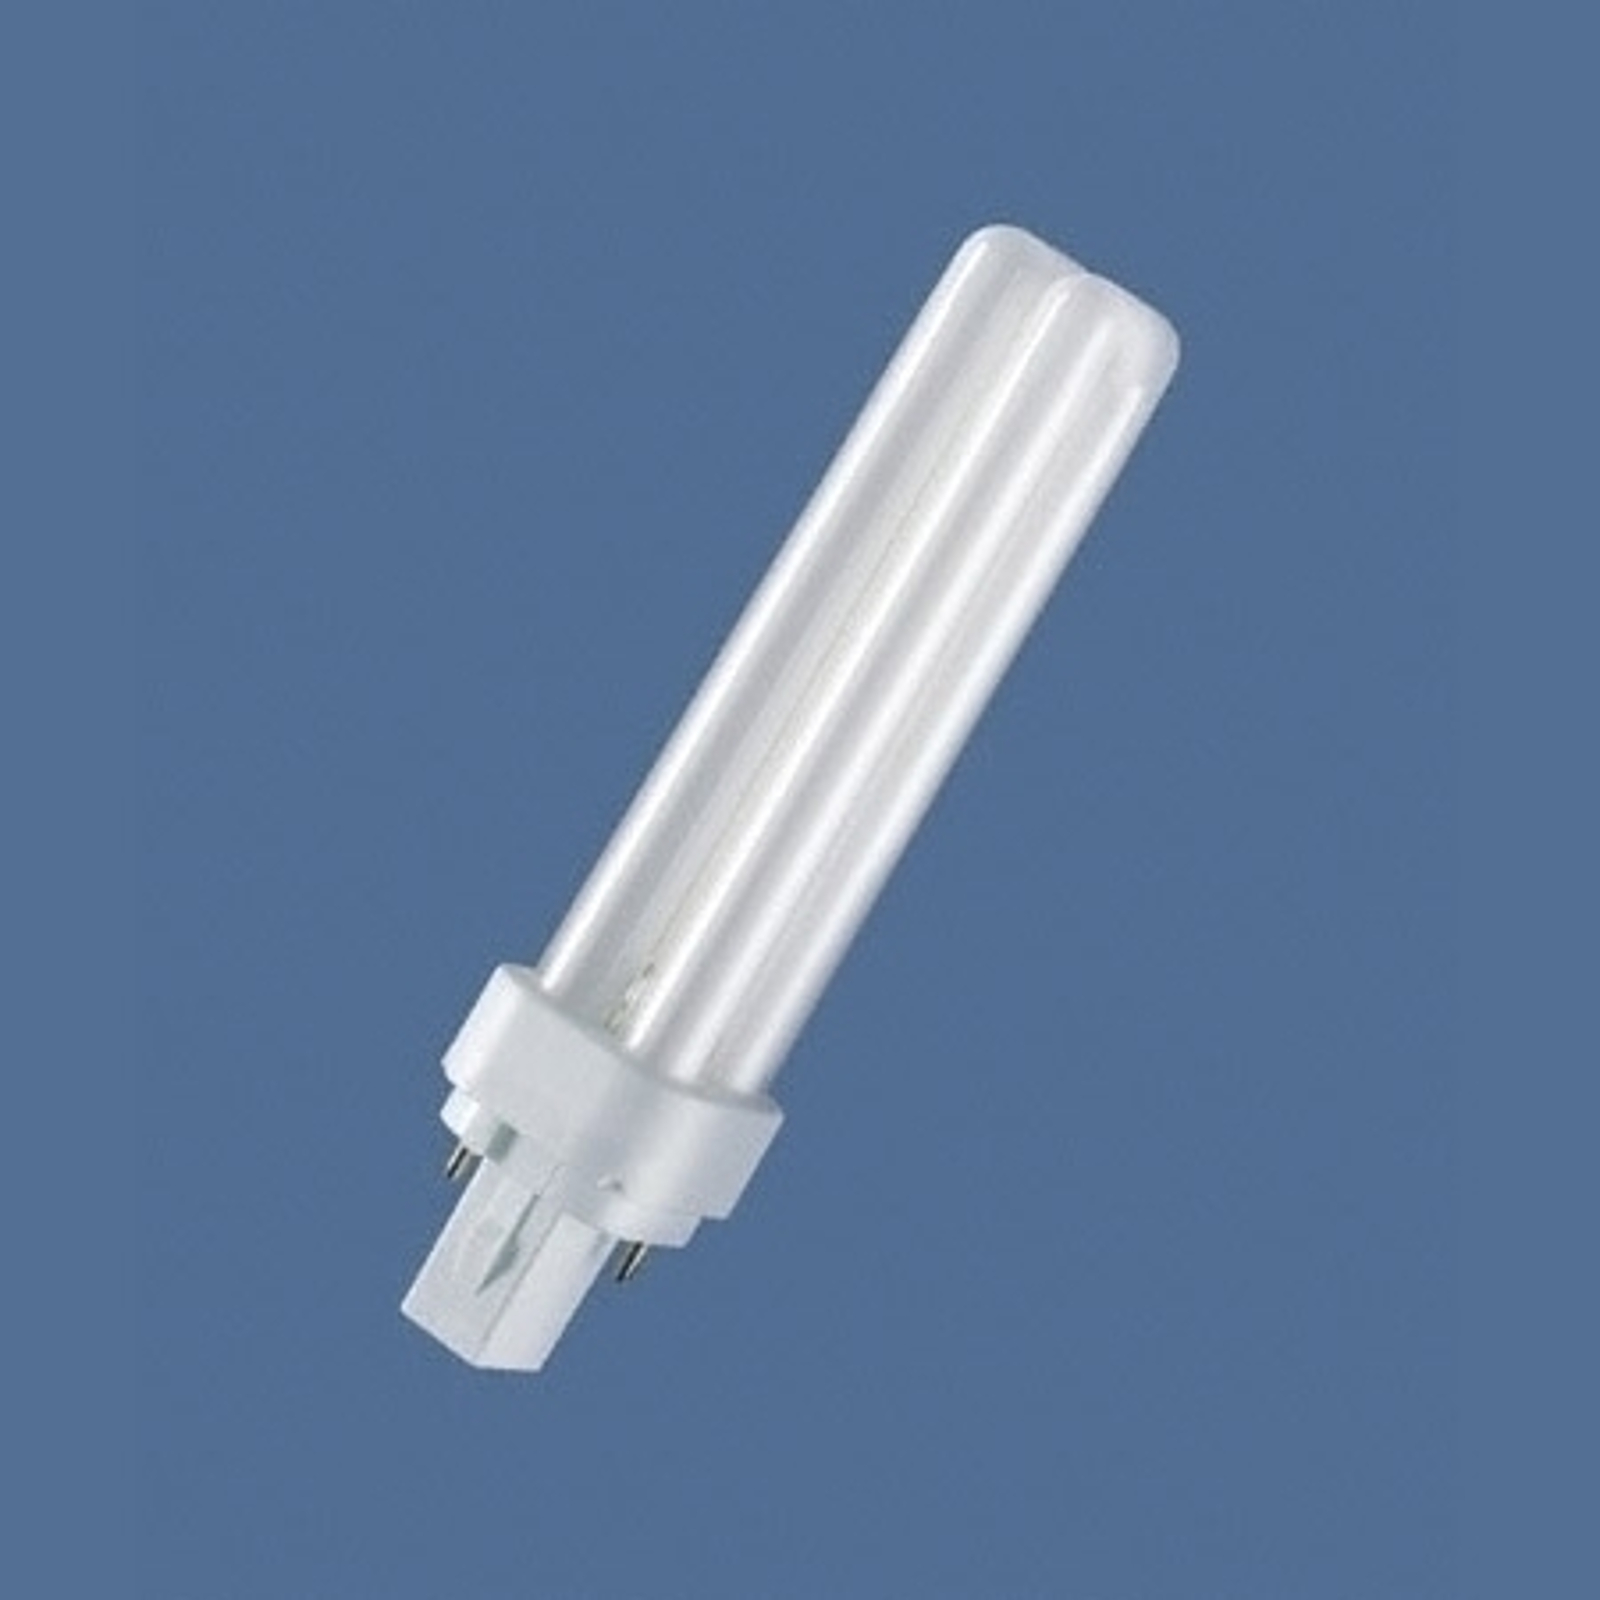 G24d 18W 840 Kompaktleuchtstofflampe Dulux D